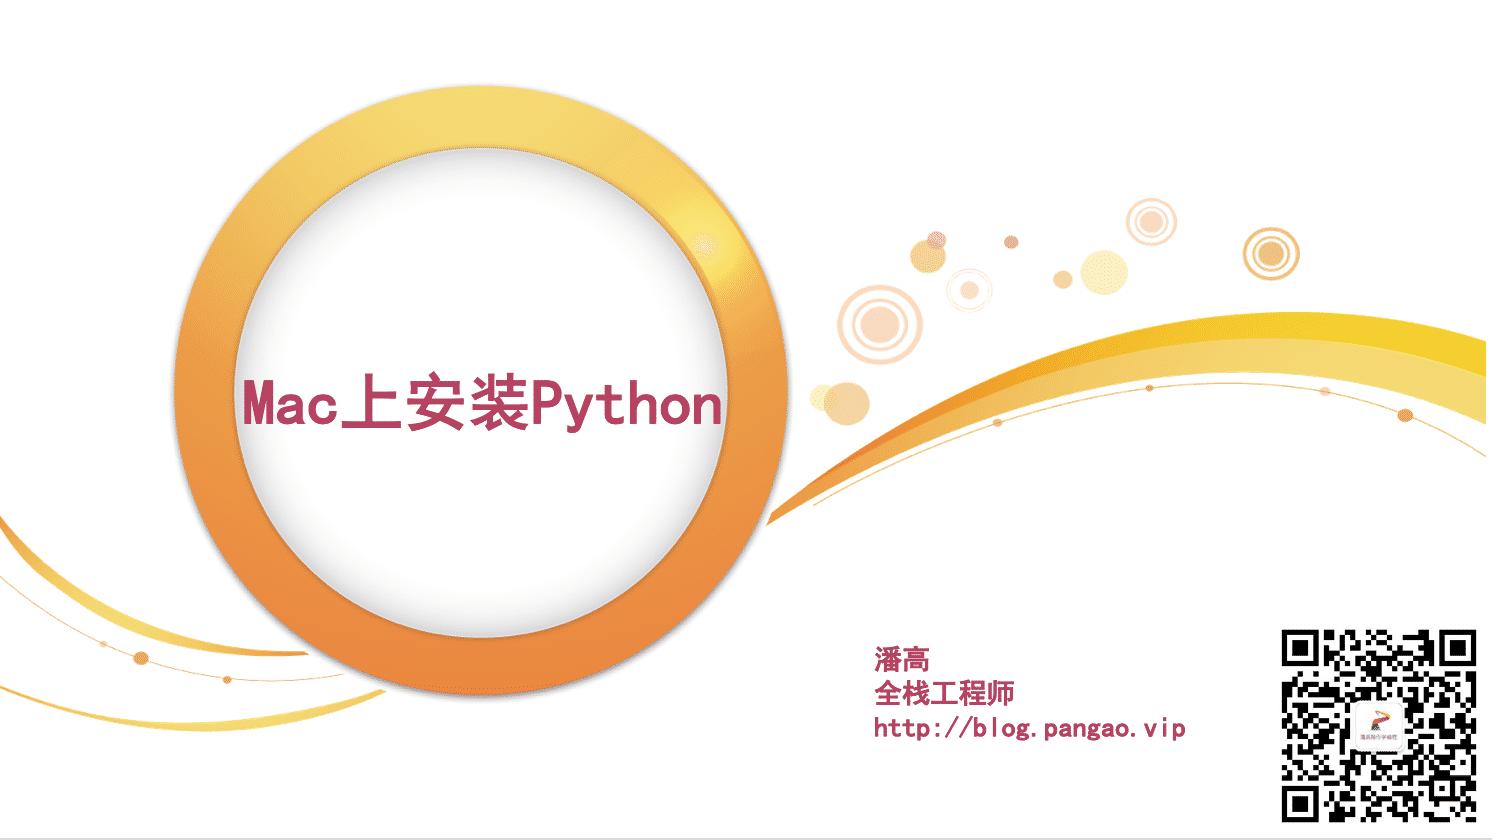 Mac上安装Python-Python入门到精通